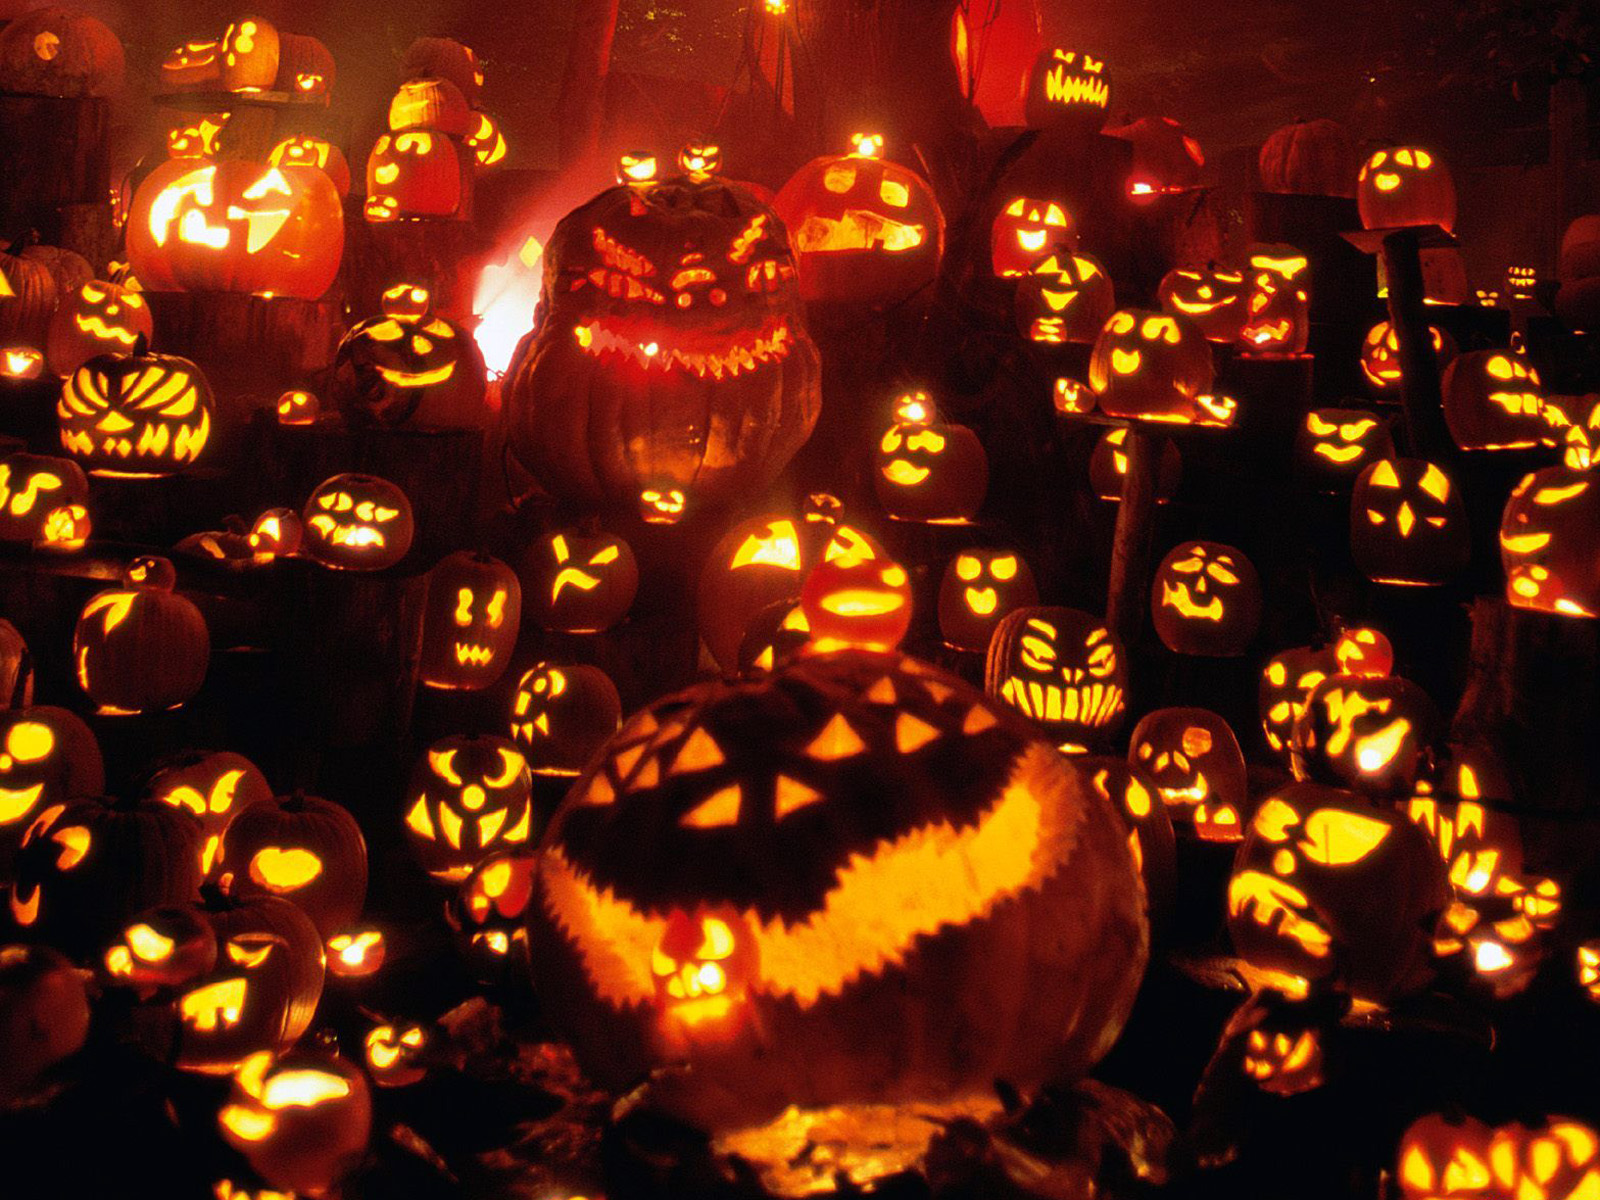 john carpenter halloween dj deville 2013 trap remix - Halloween Theme Remix